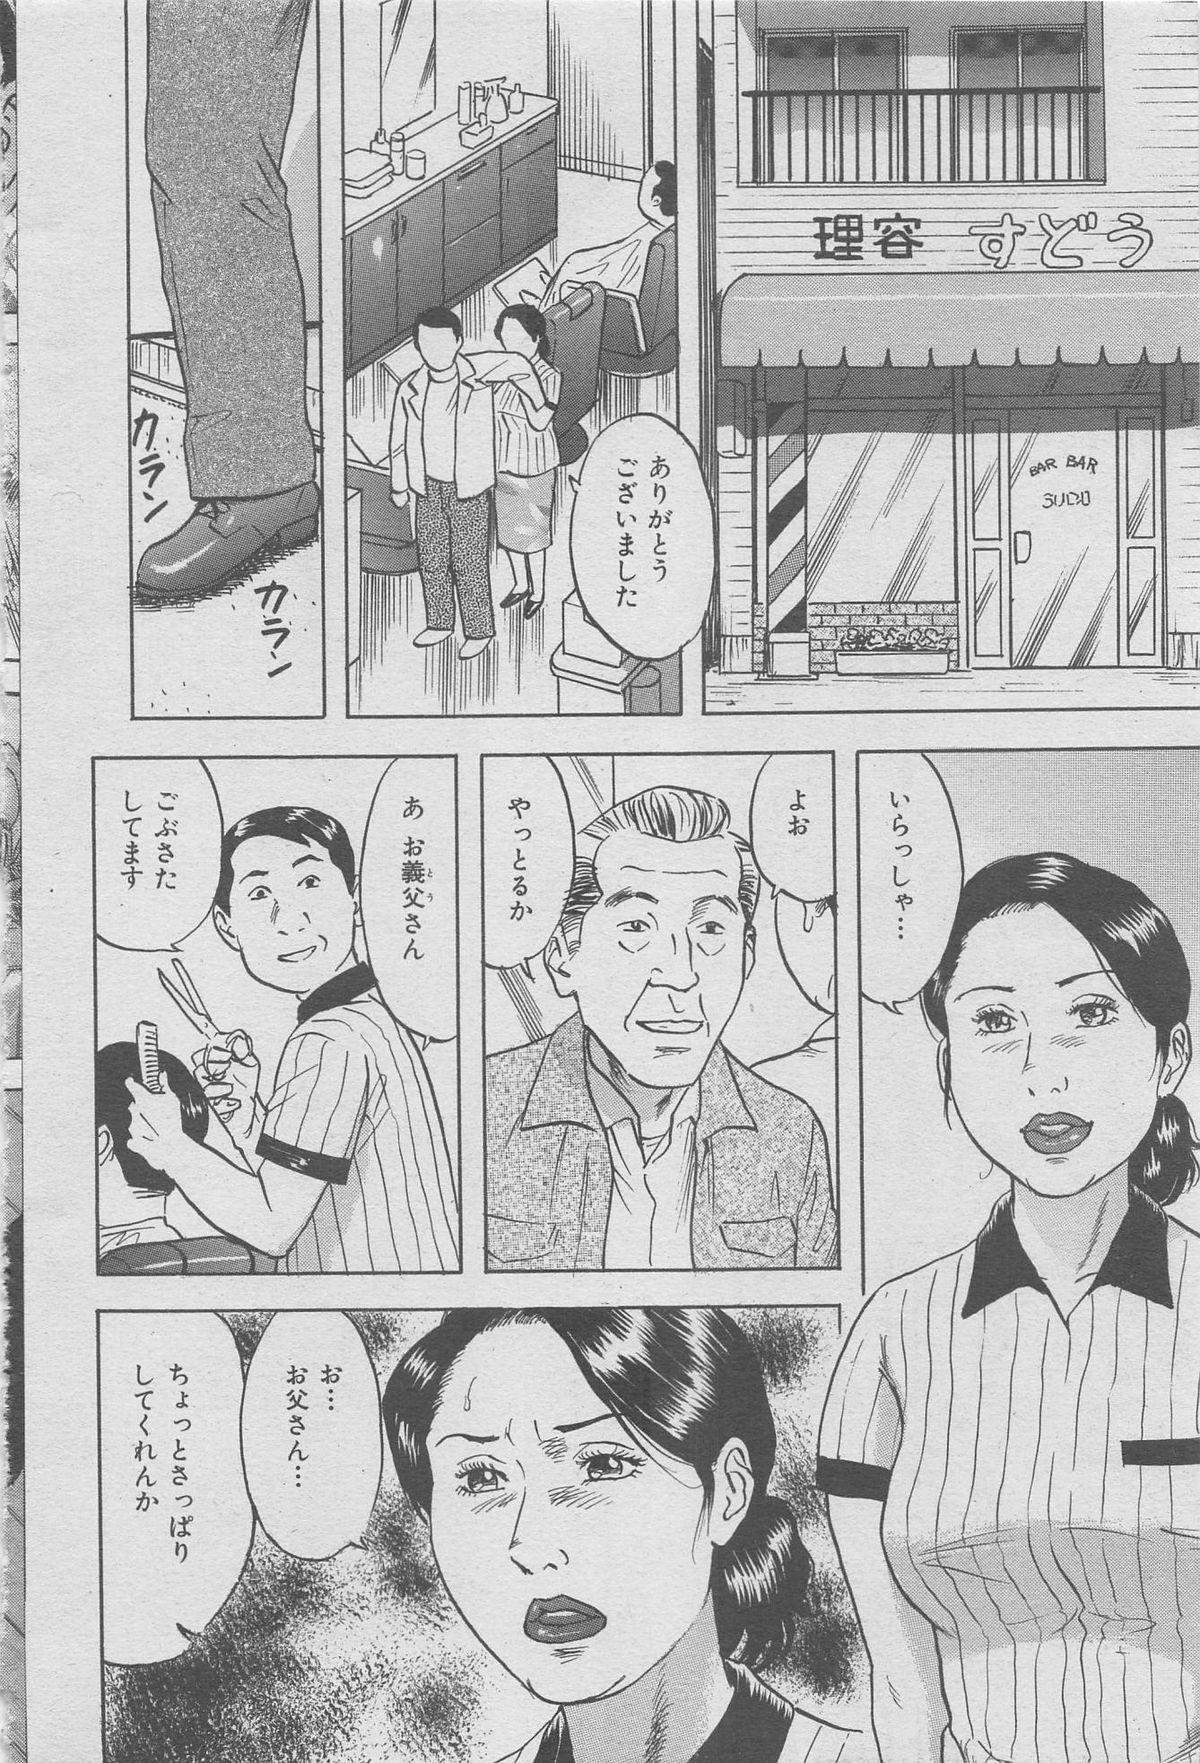 Hontou ni Atta Kindanai vol.7 115